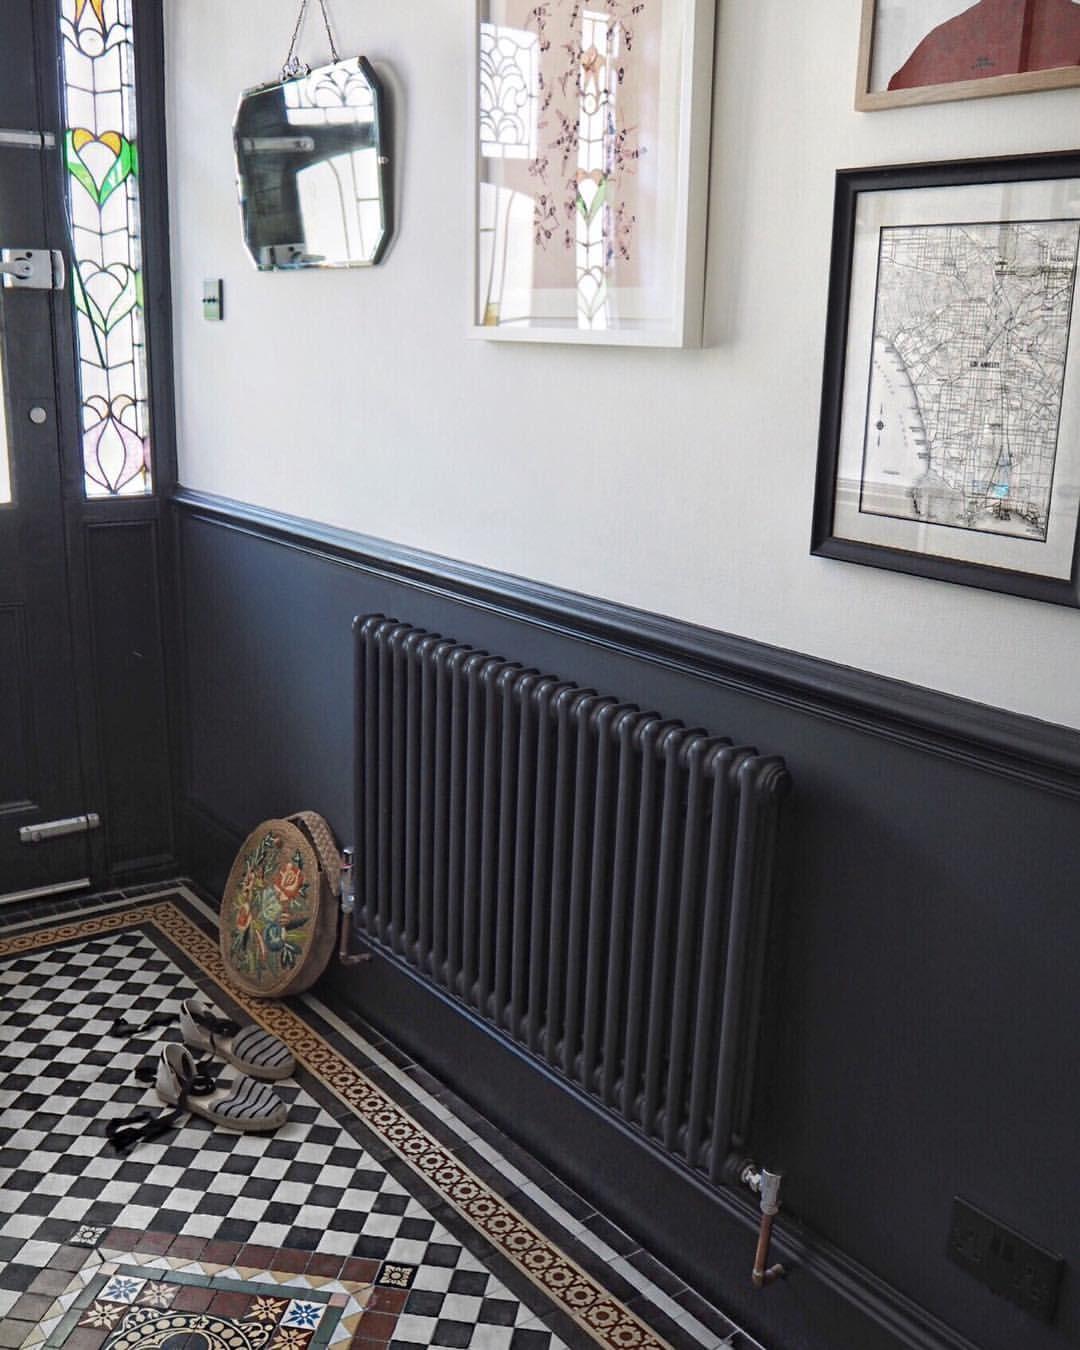 Soubassement Couloir En Bois f&b railings, dulux walls, and acova radiator from screwfix